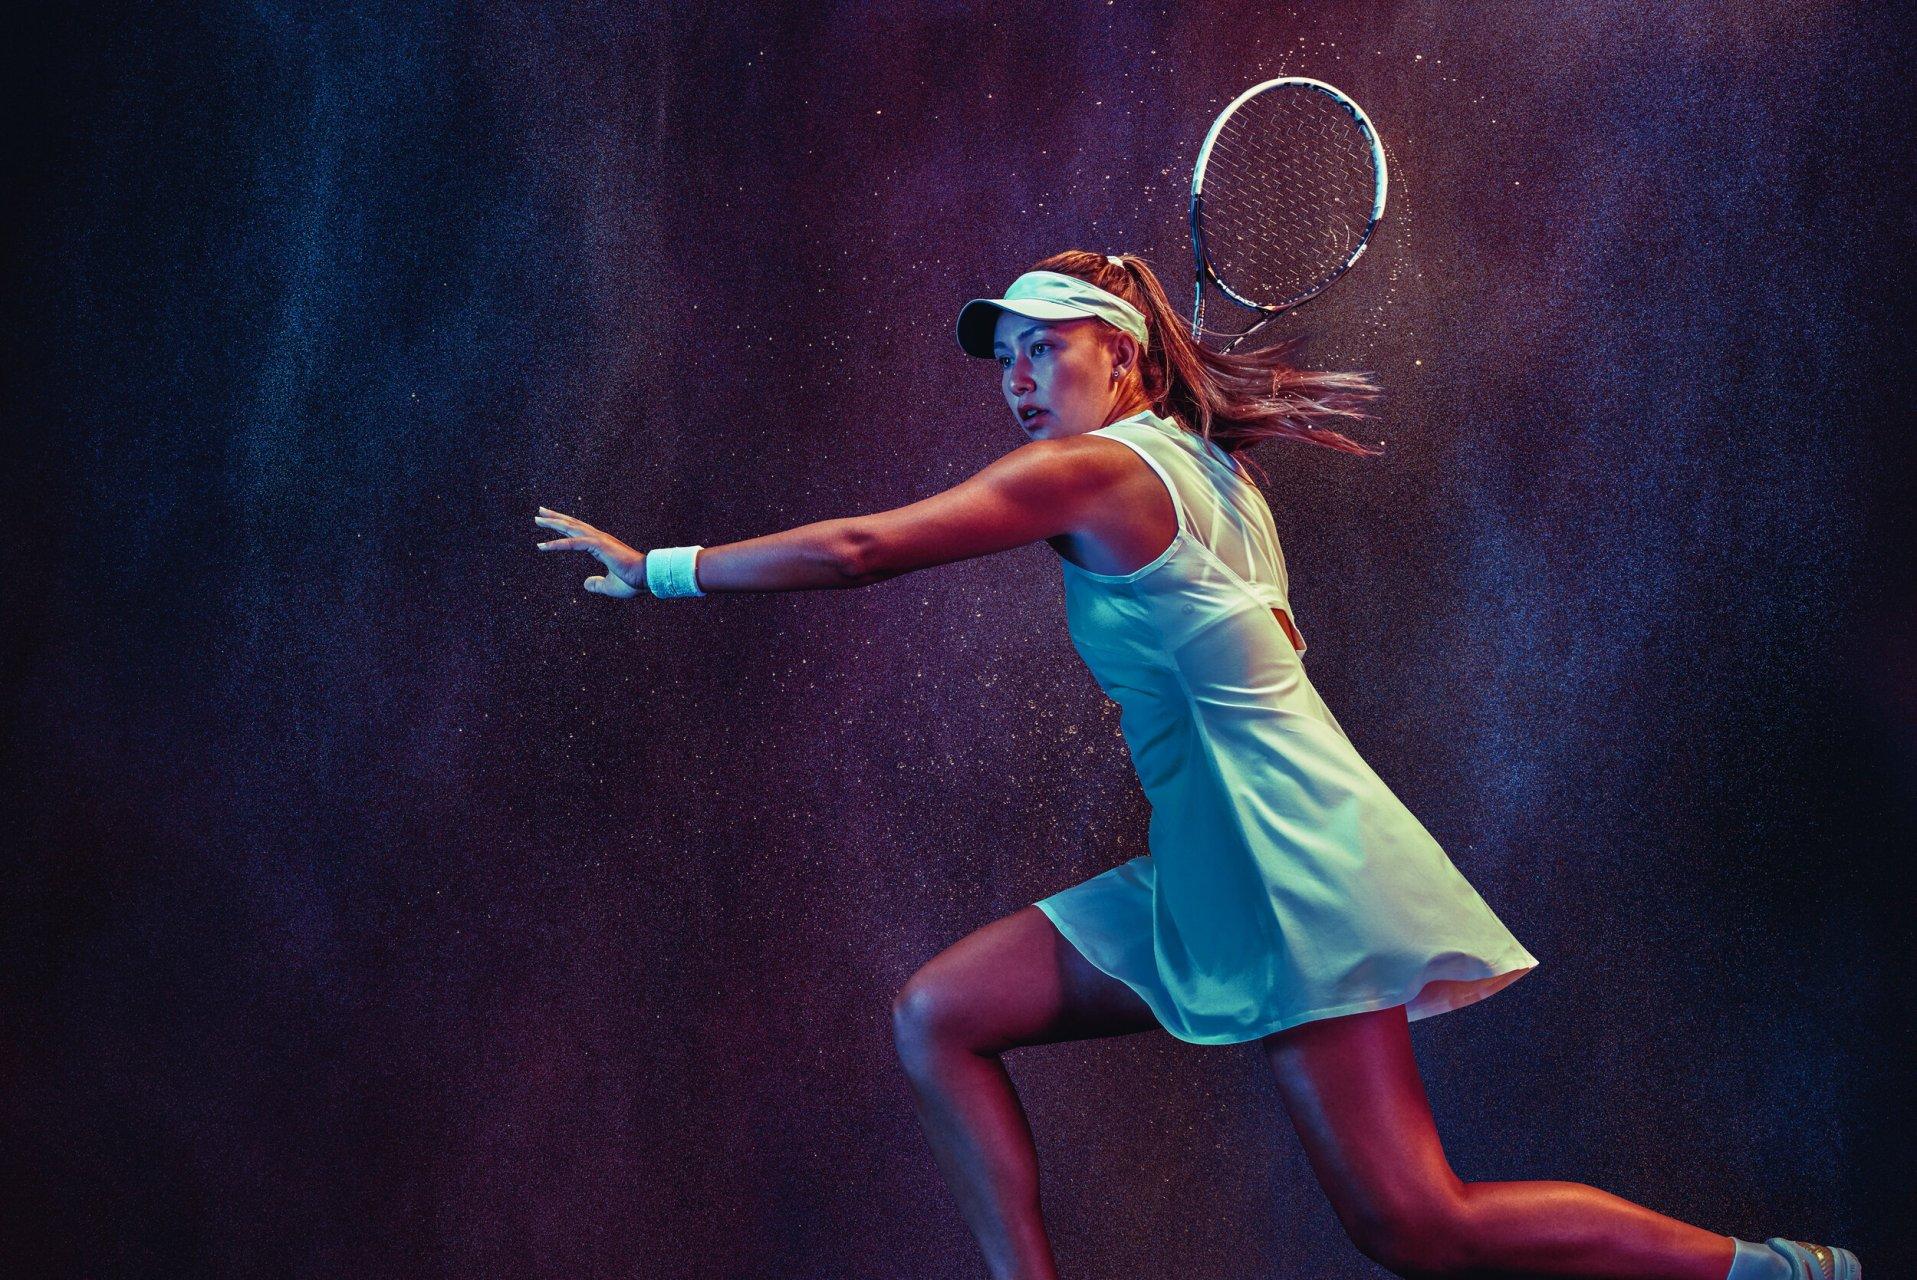 MGM_BET_Tennis_2906